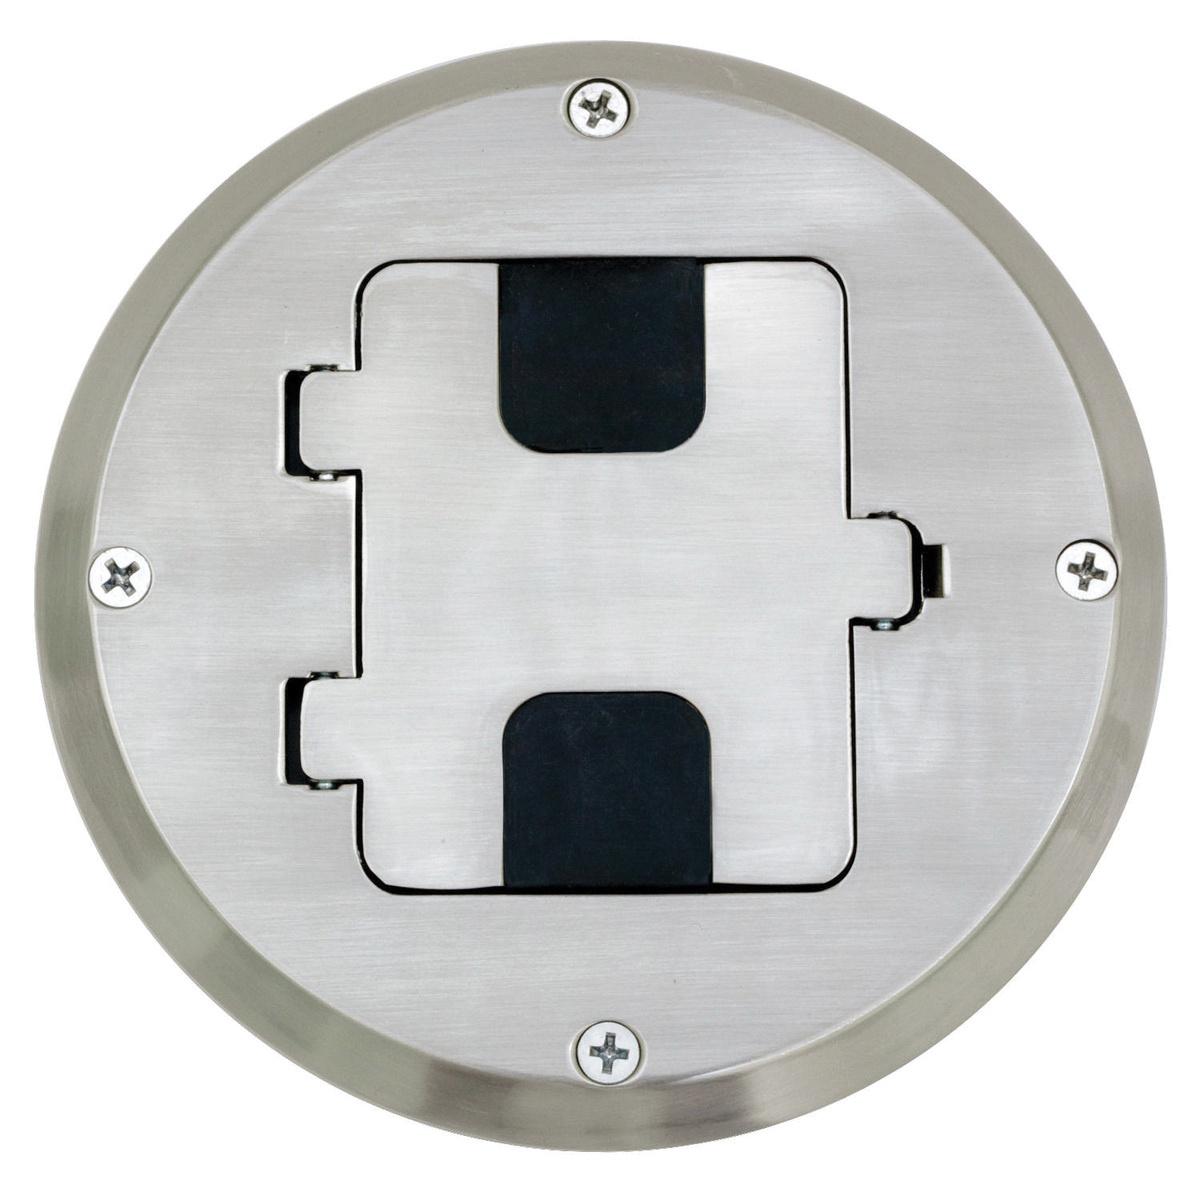 Hubbell Wiring Rf515ni 1 Gang Flush Floor Box Kit 5 6 Inch